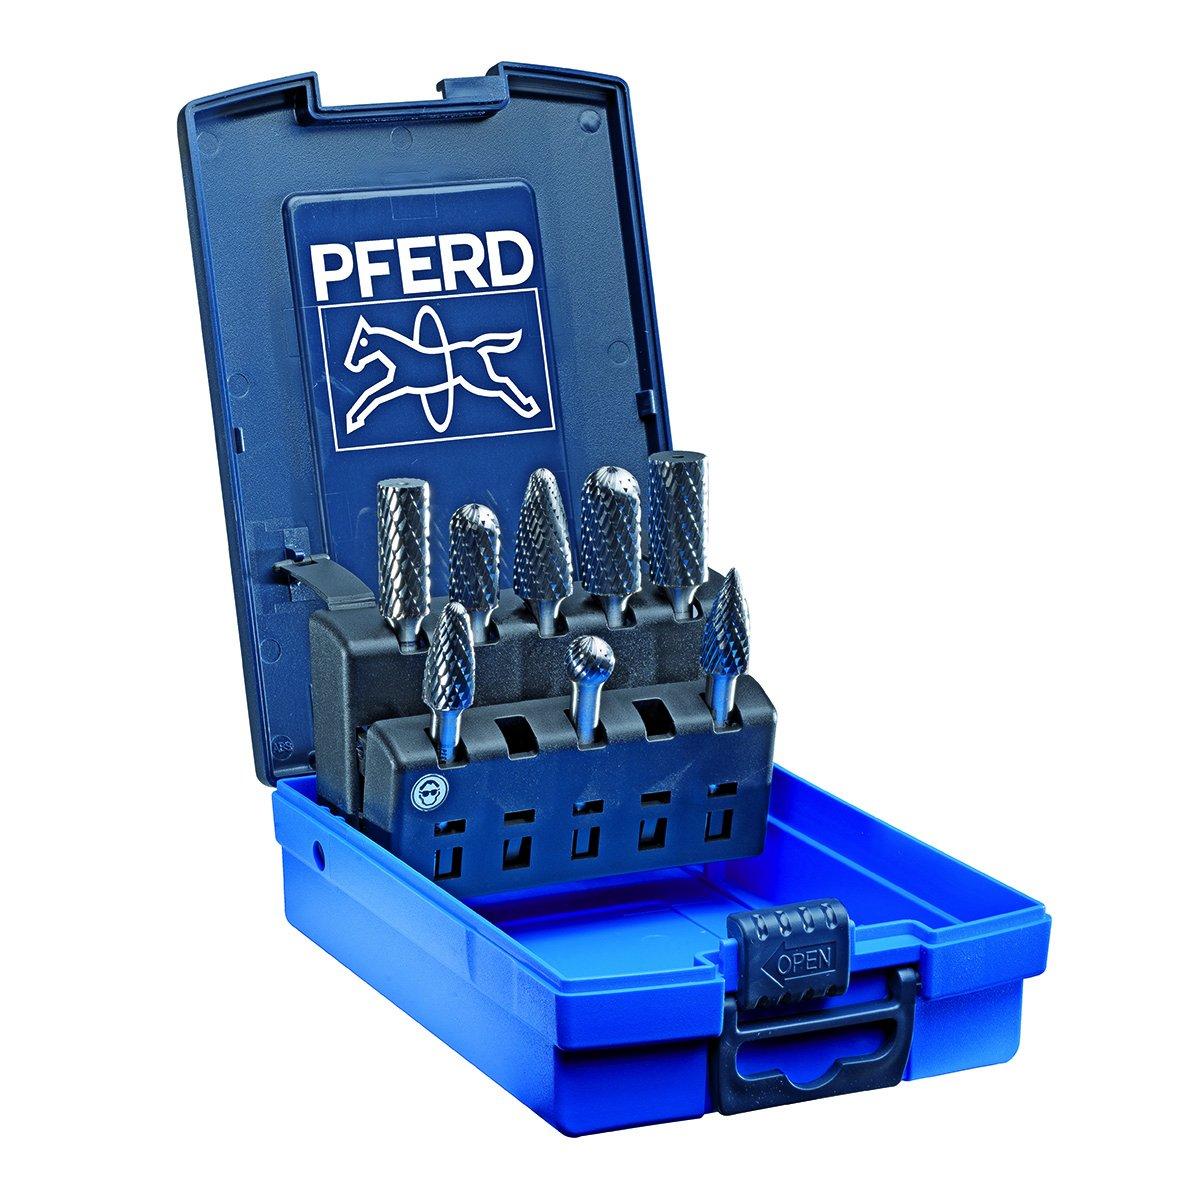 1//4 Shank 1//4 Shank PFERD Inc. PFERD 26547 8 Piece Double Cut Carbide Bur Set with Plastic Case